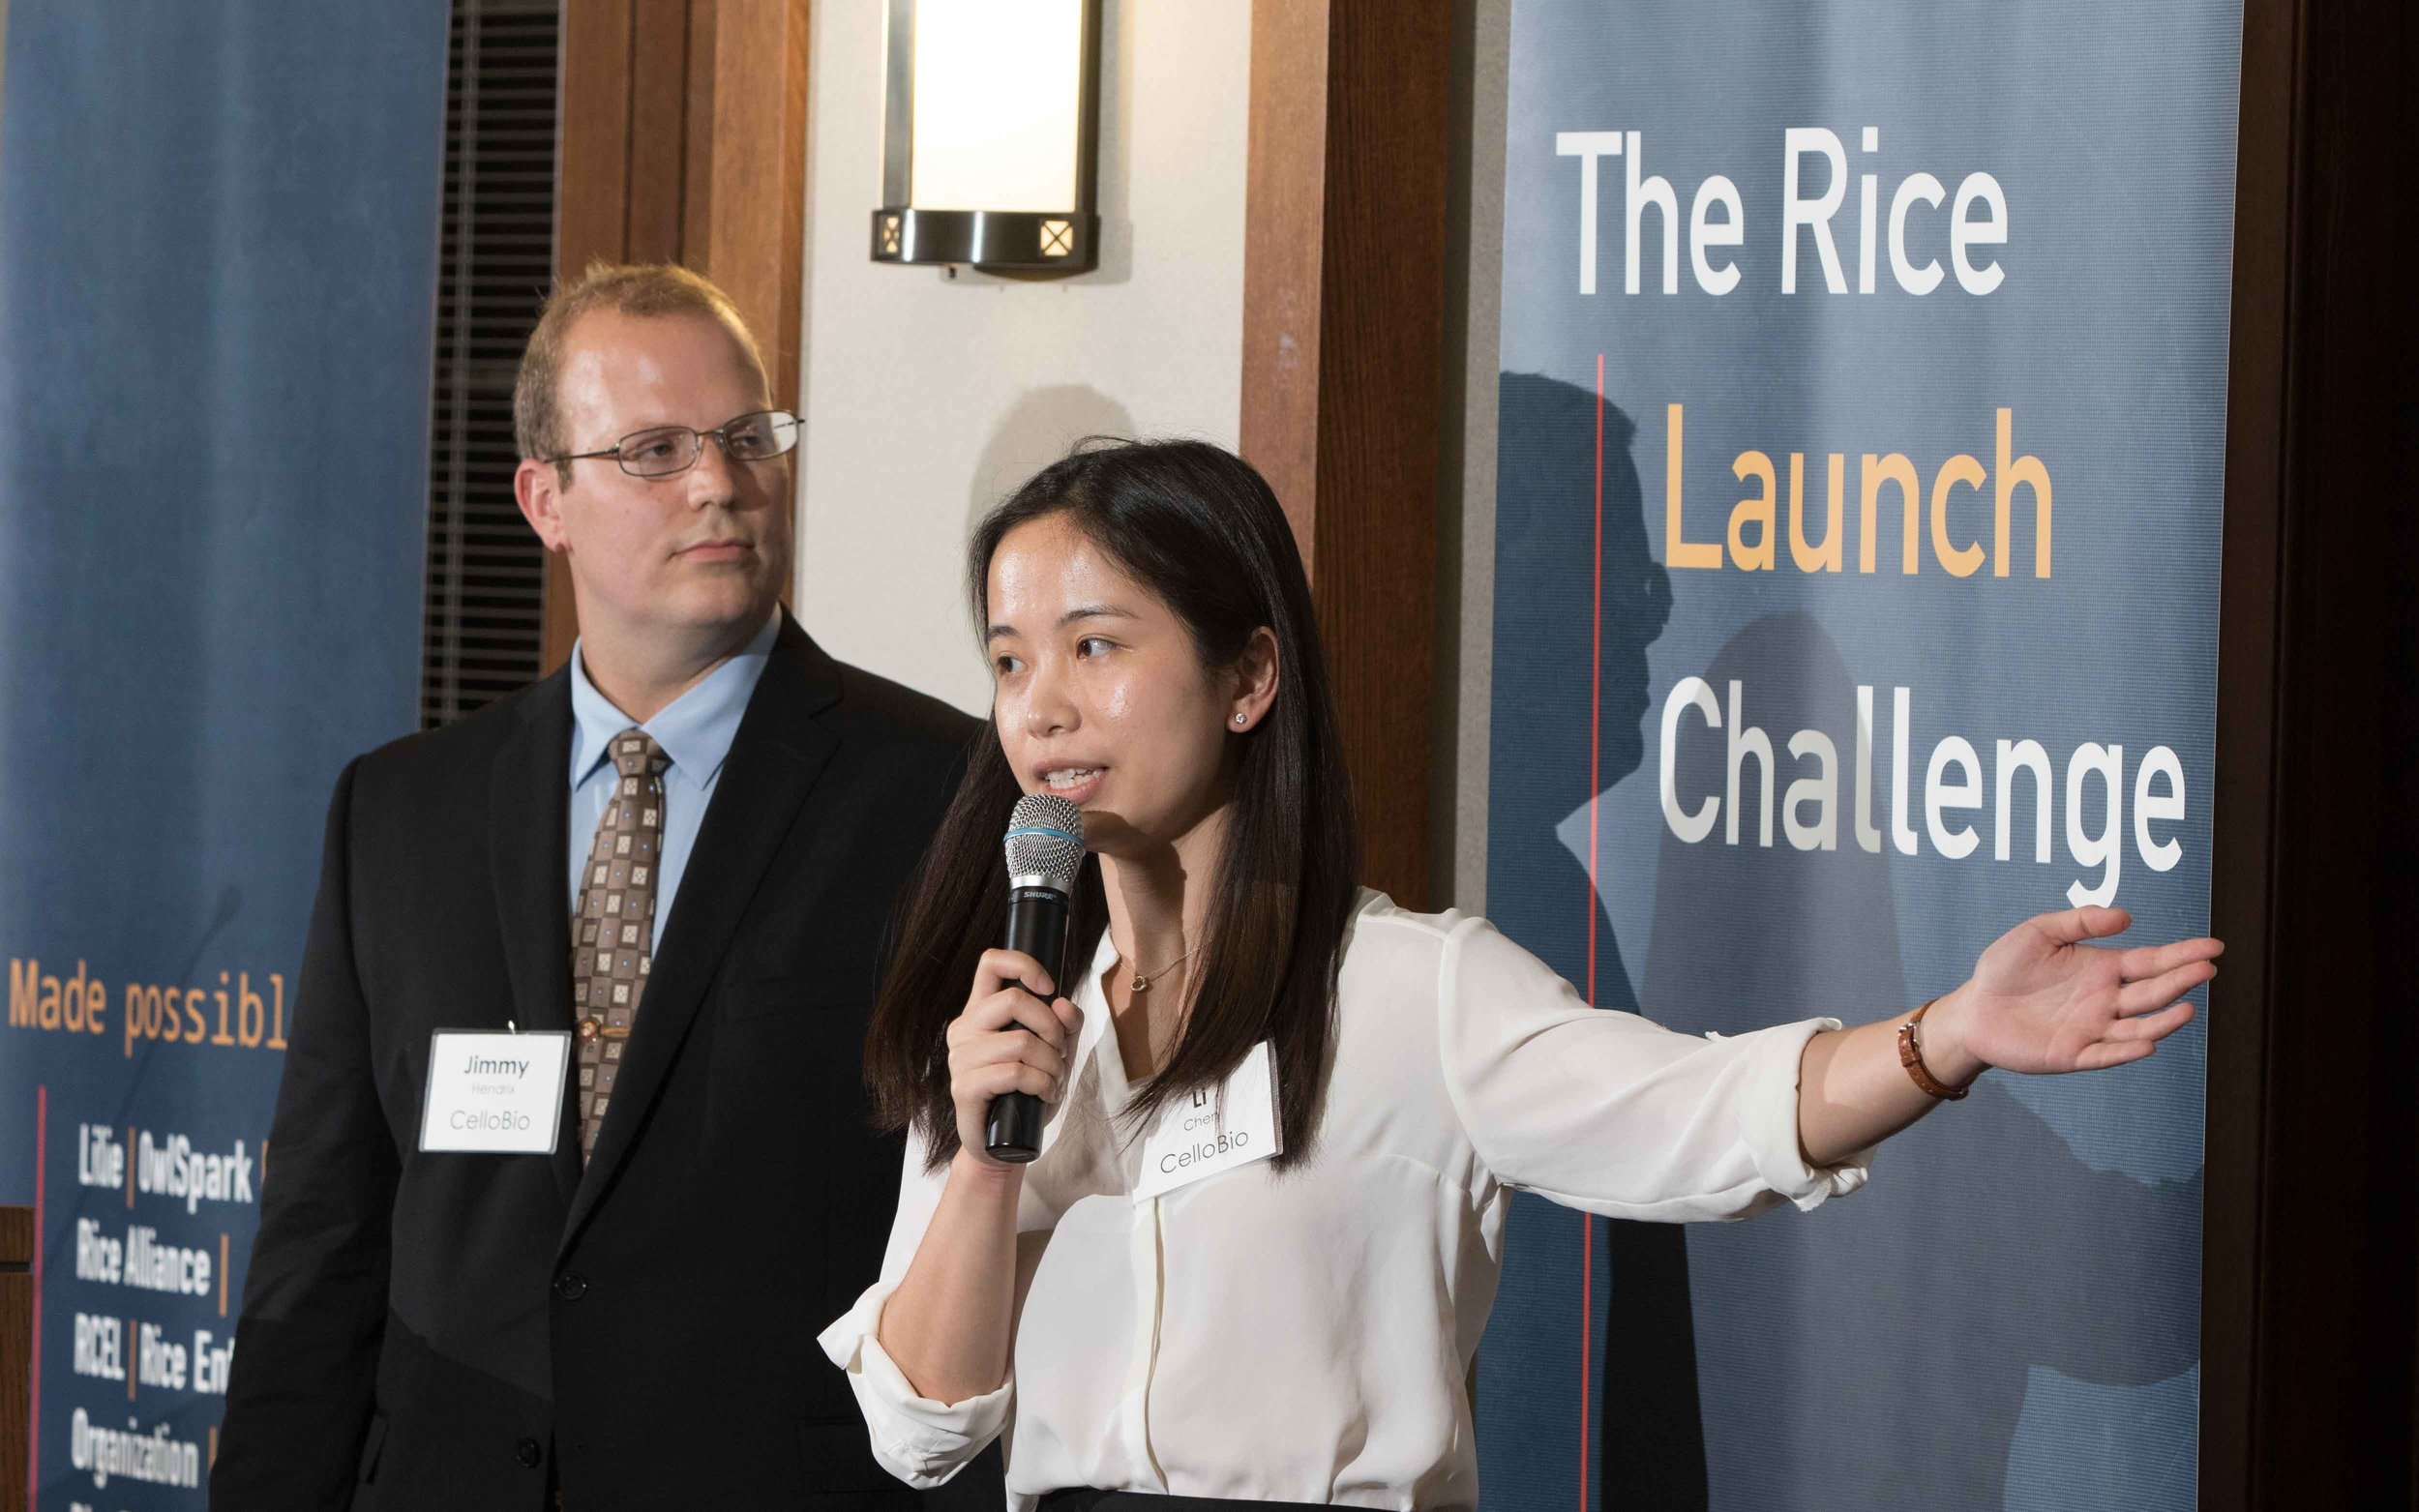 Rice University - Launch Challenge 29Mar2017-73Rice University - Launch Challenge 29Mar2017.JPG